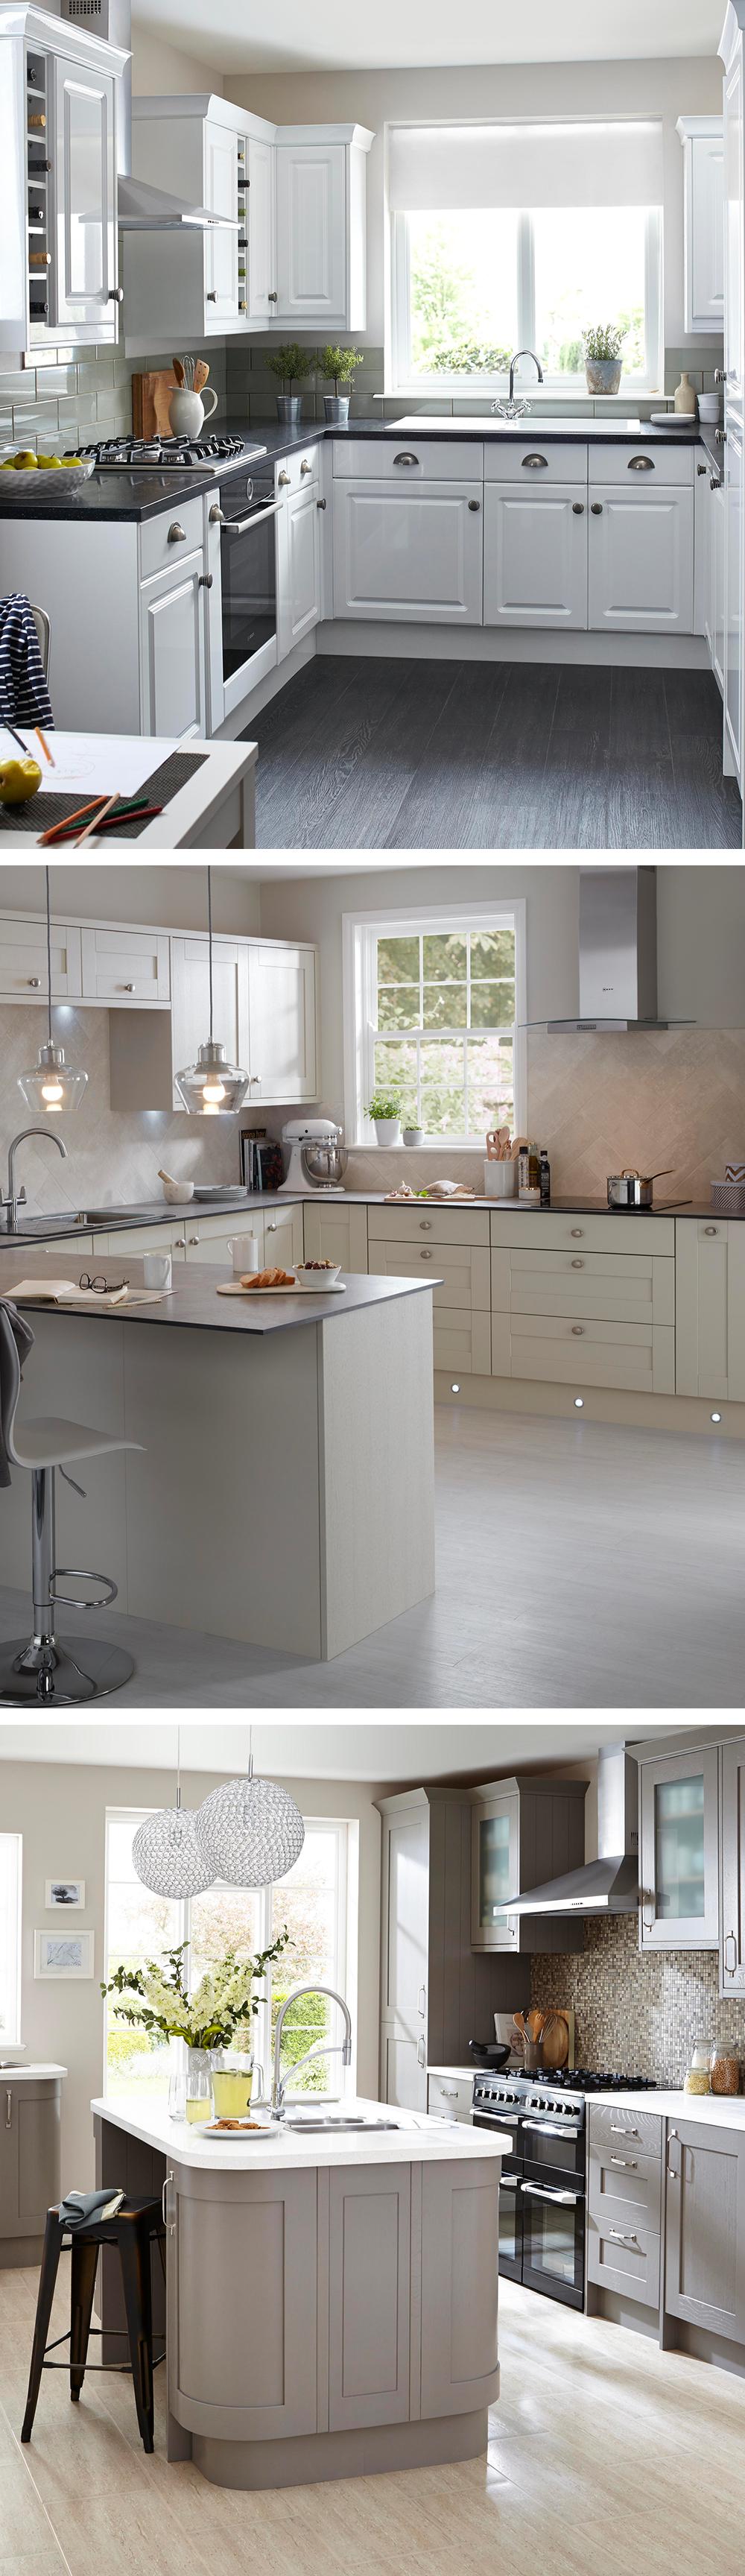 Soft Kitchen Flooring Neutral Kitchens Look Understated And Stylish Effortlessly Pair